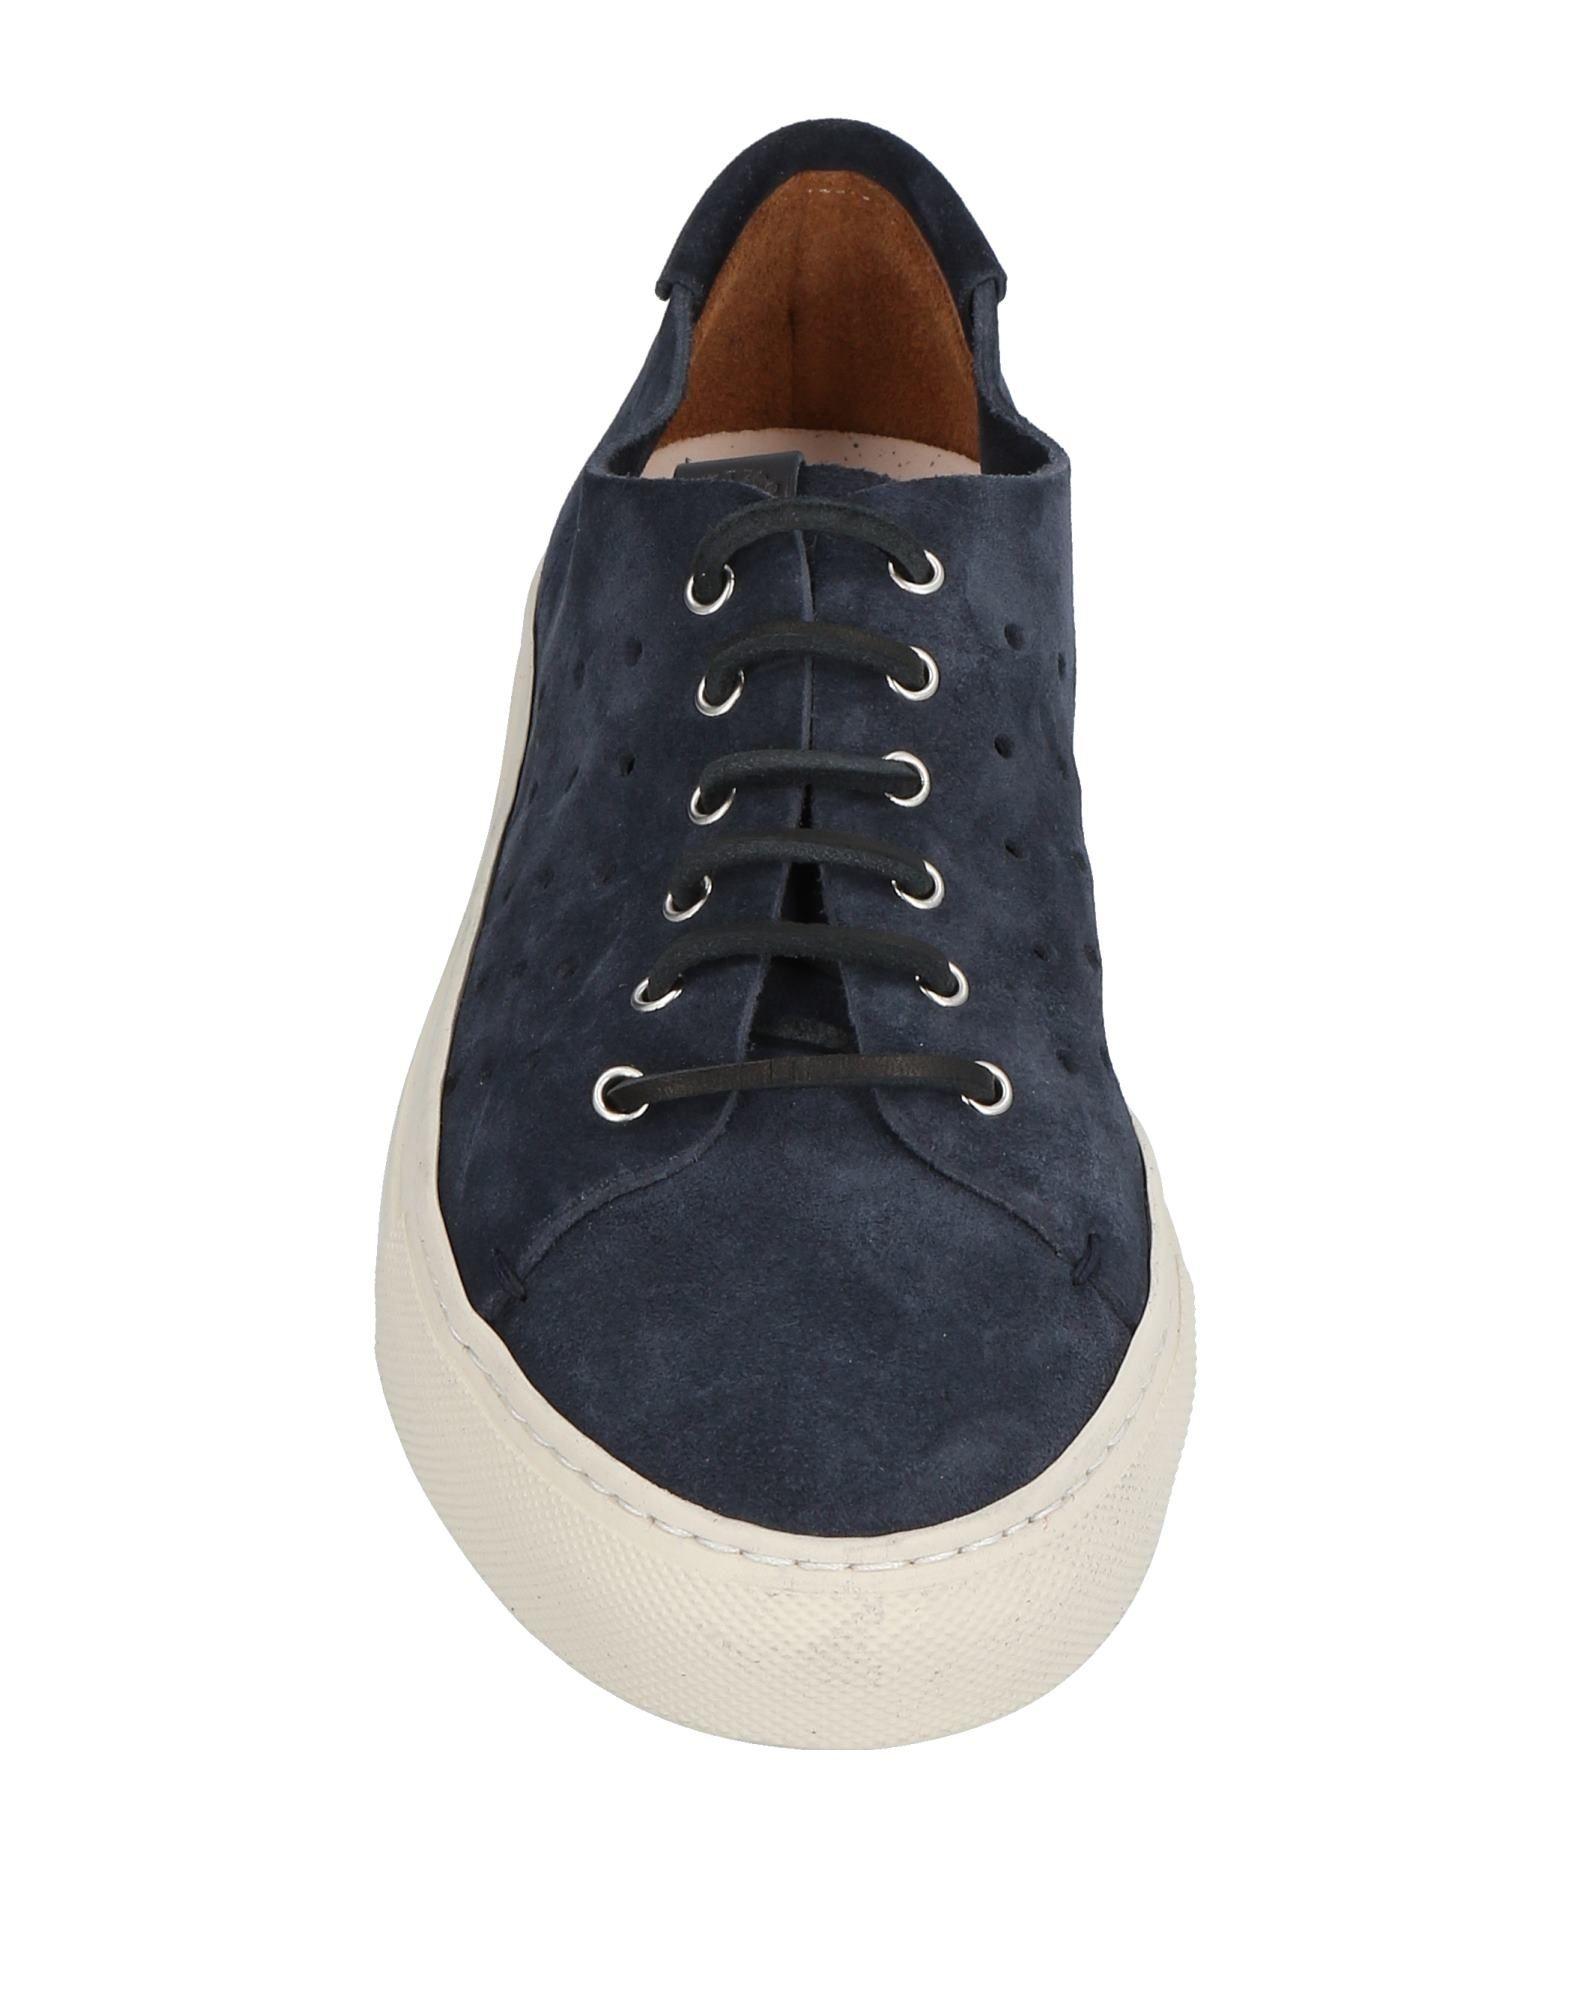 Stilvolle billige Schuhe 11165699AB Buttero® Sneakers Damen  11165699AB Schuhe 02aabb